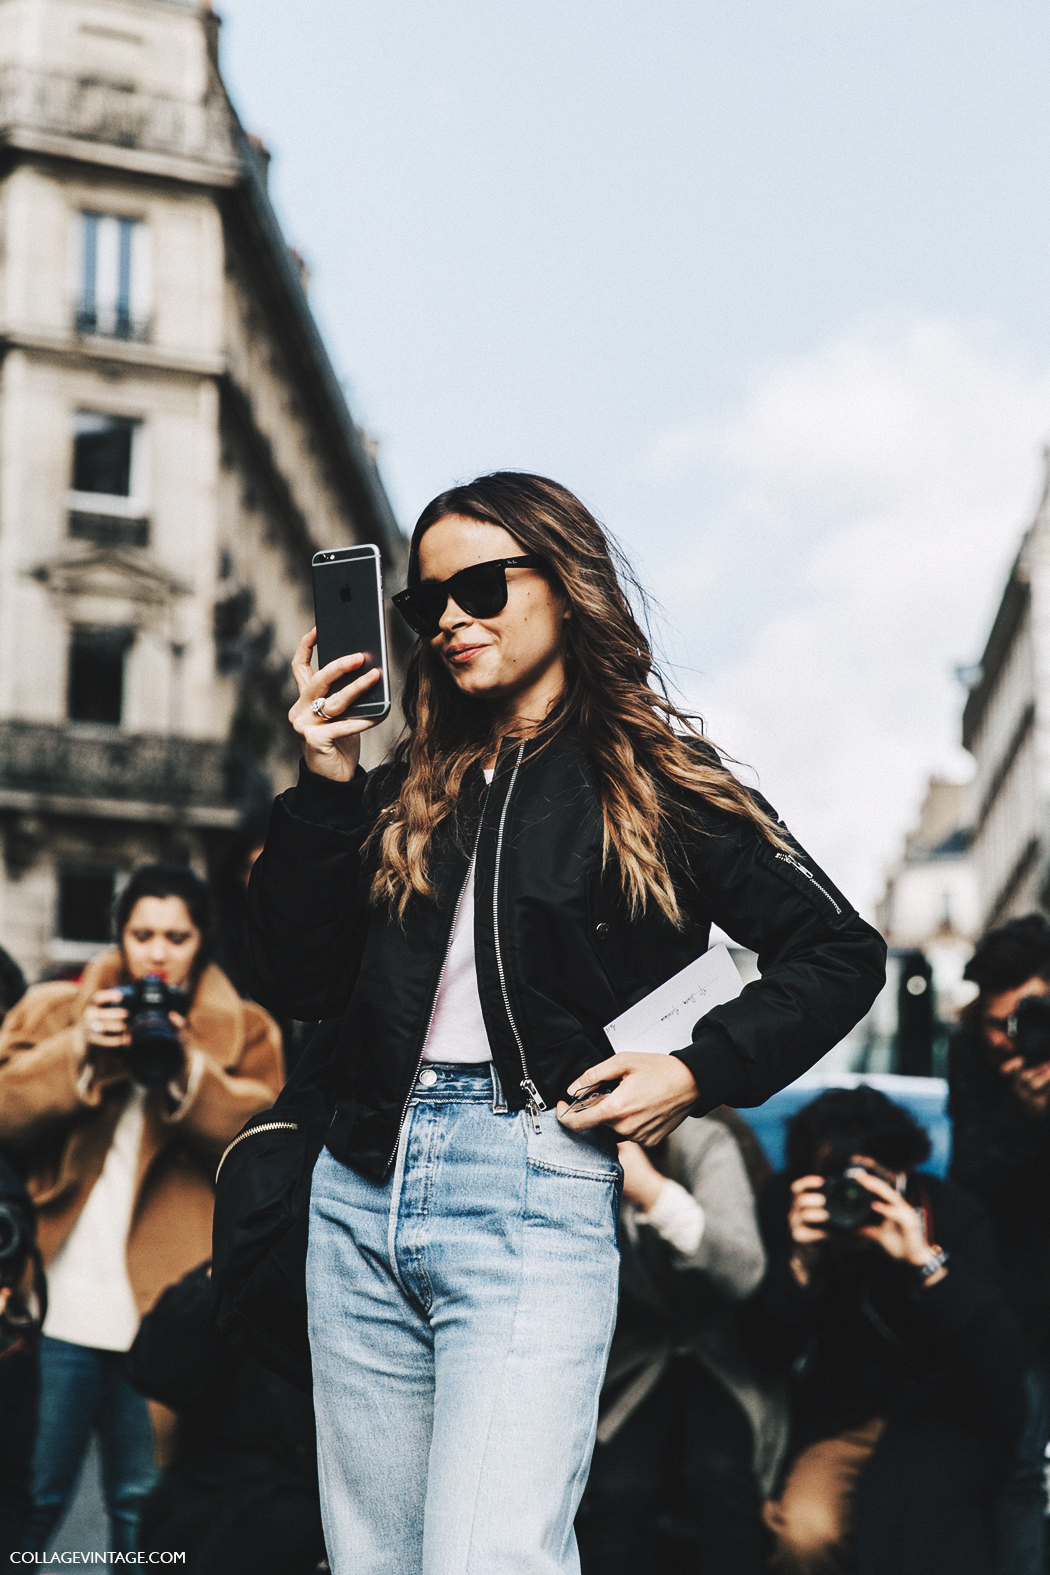 PFW-Paris_Fashion_Week_Fall_2016-Street_Style-Collage_Vintage-Miroslava_Duma-Vetements-Jeans-Backpack-Bomber-5